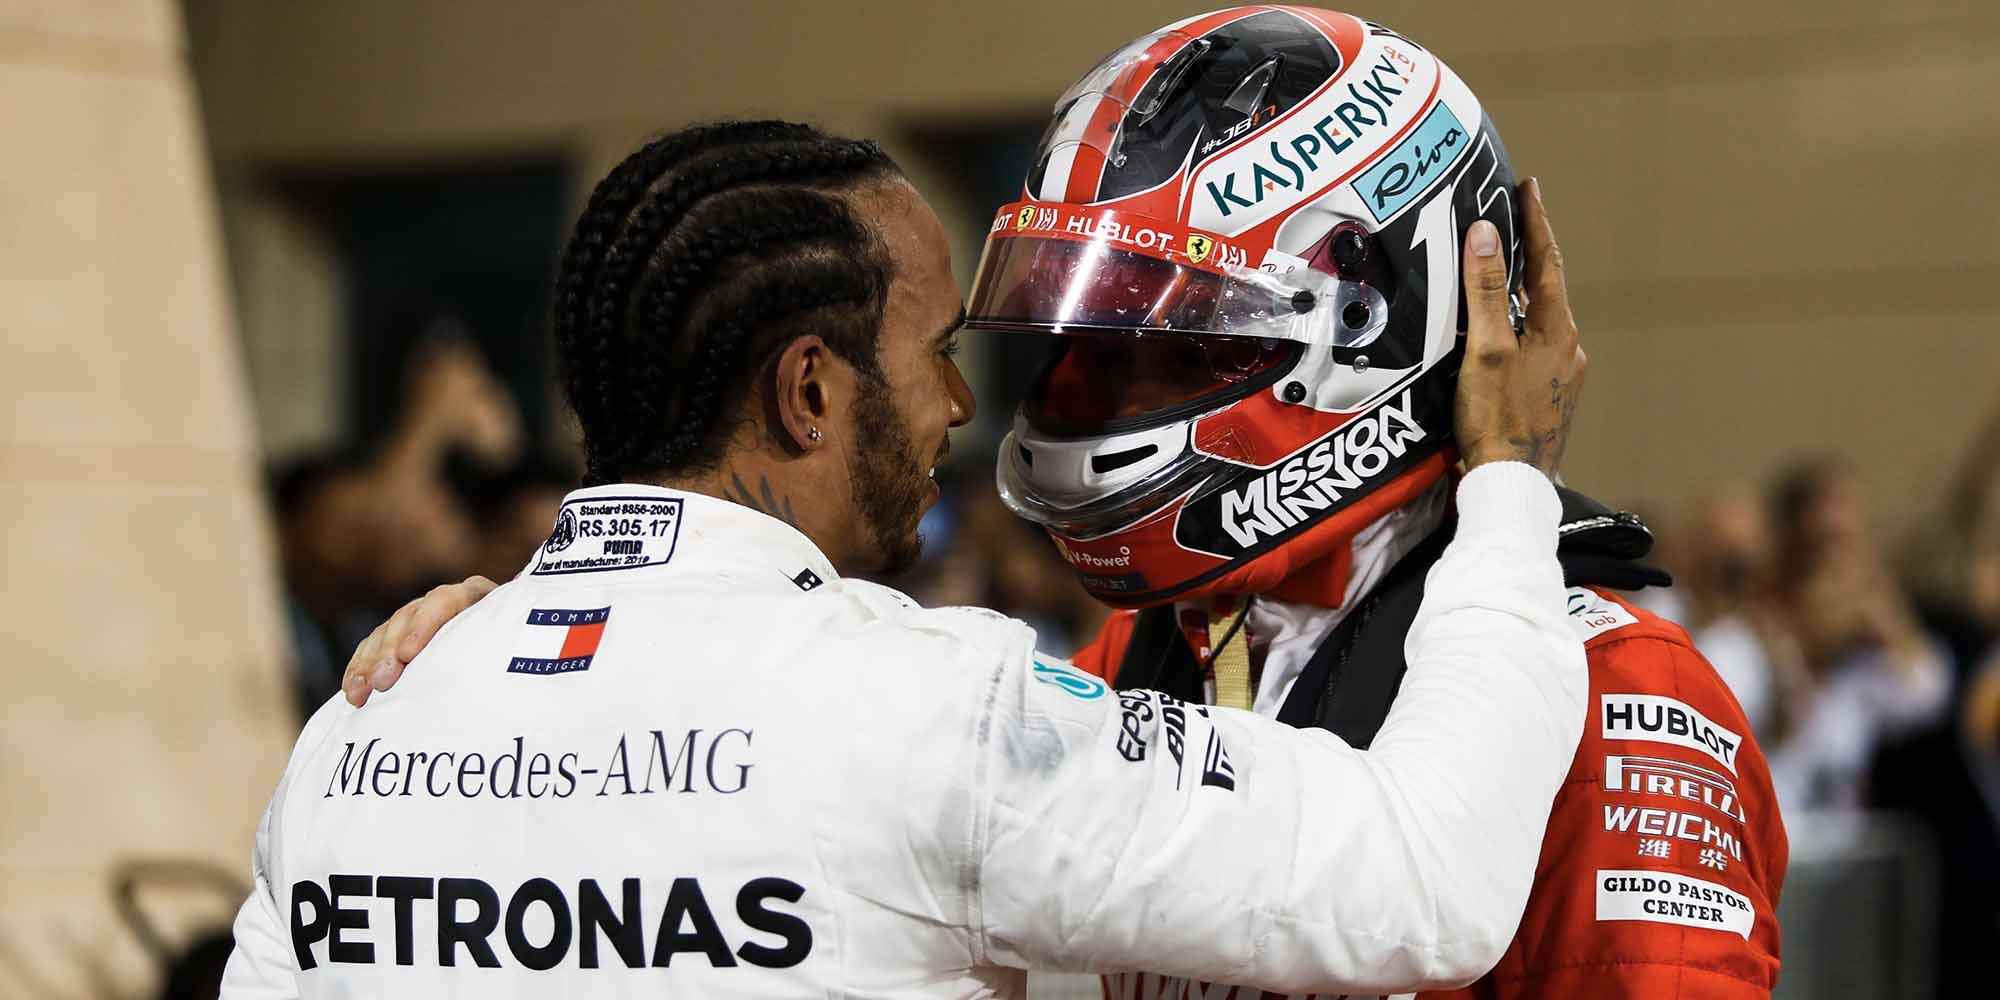 Best races of the 2019 F1 season: Bahrain Grand Prix